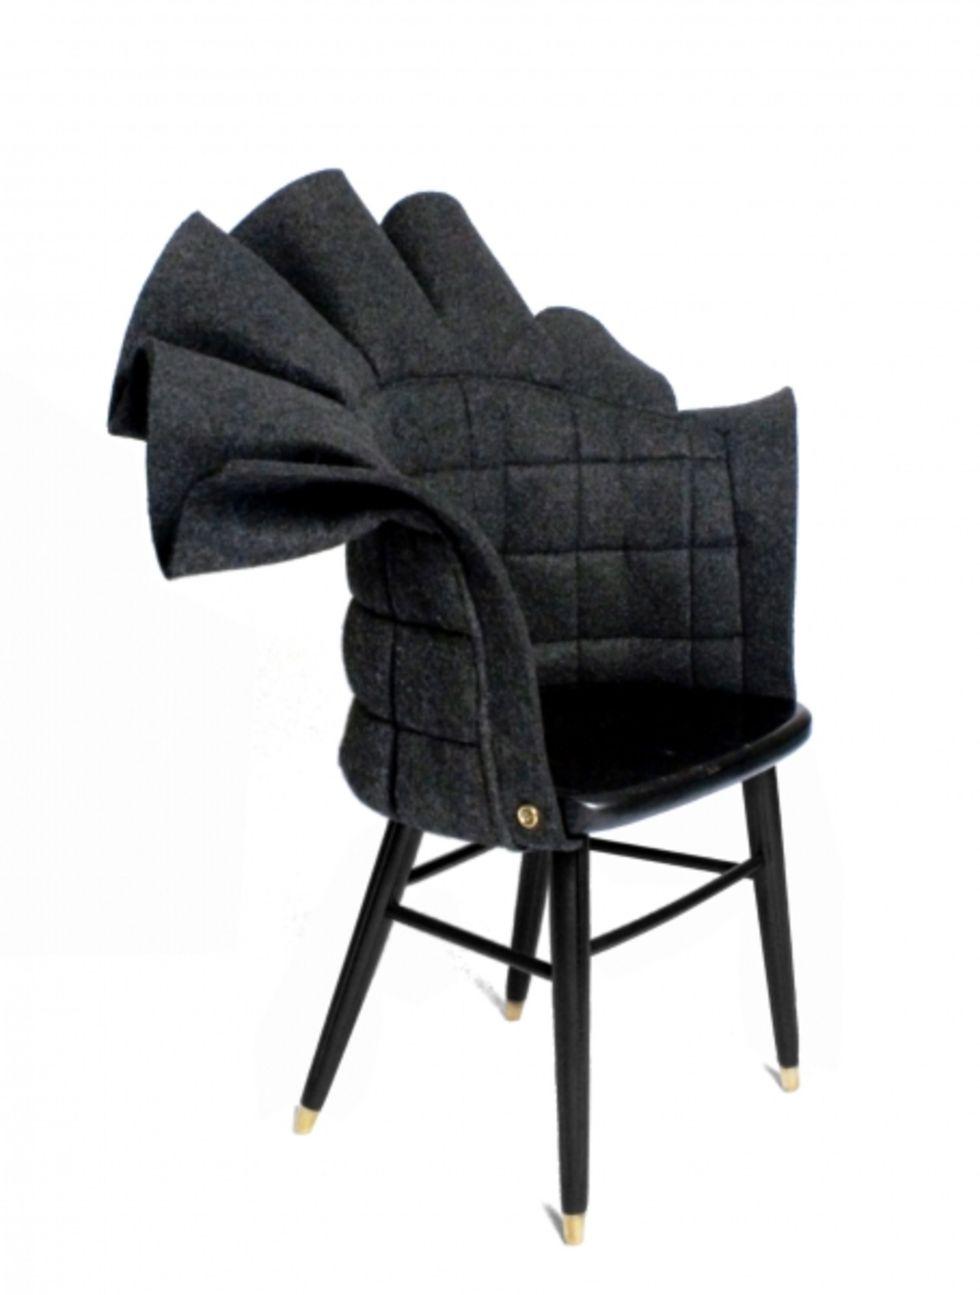 Gamla stolar får nya kläder